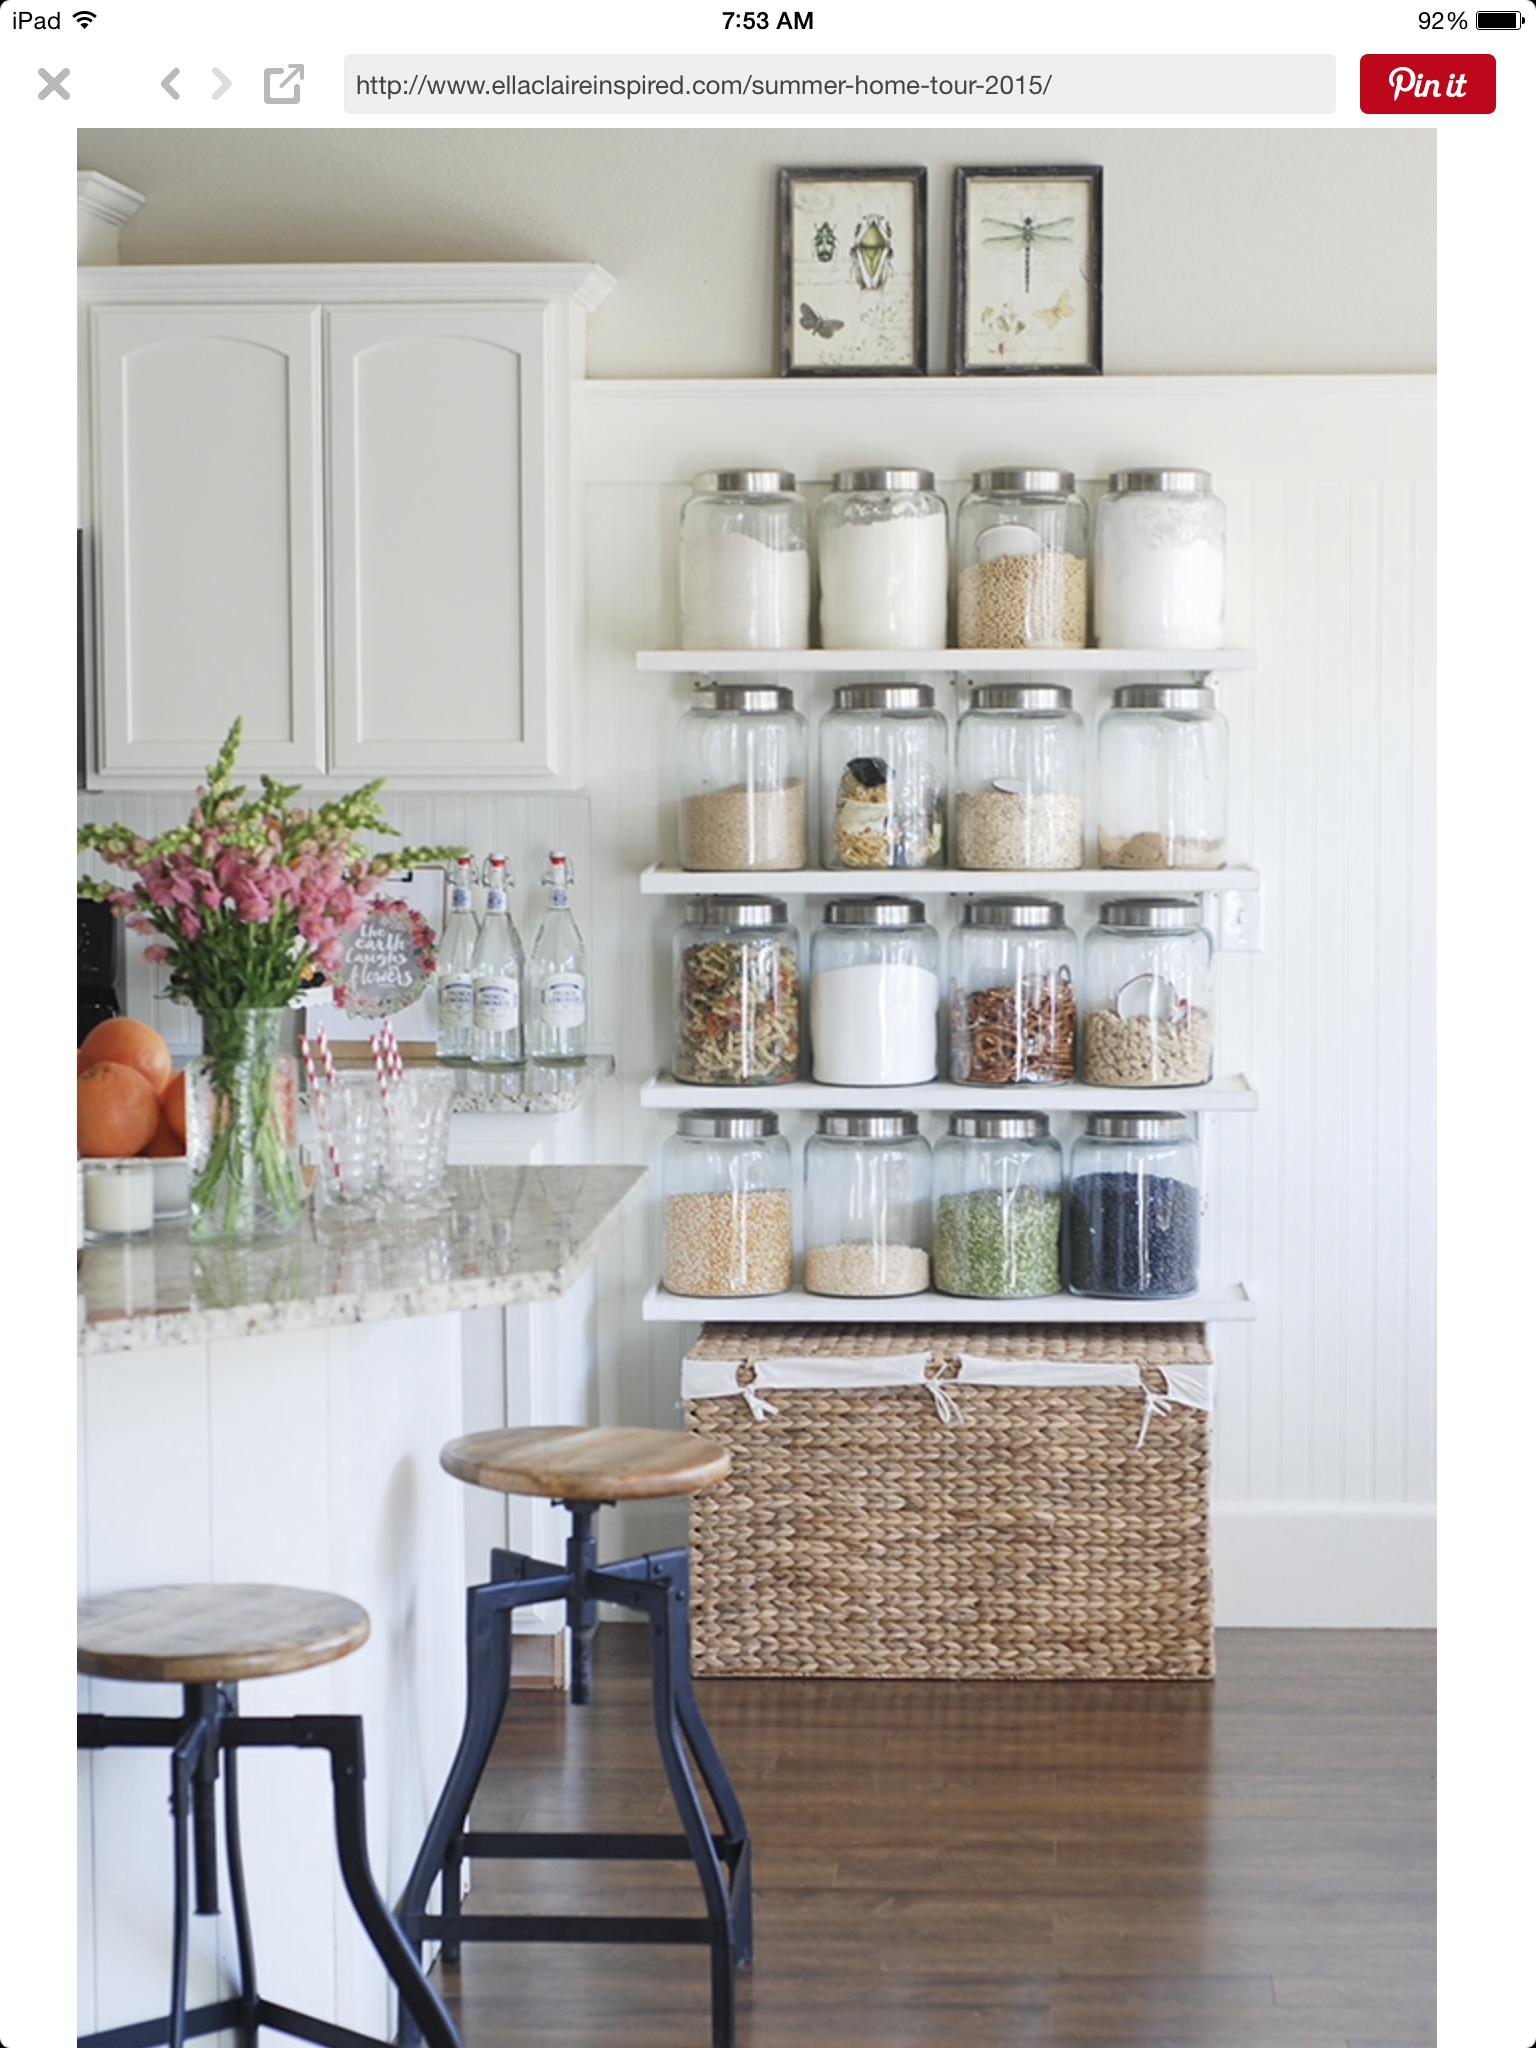 Pin by Mary Lynn Hart on Kitchen | Pinterest | Kitchens, Storage ...